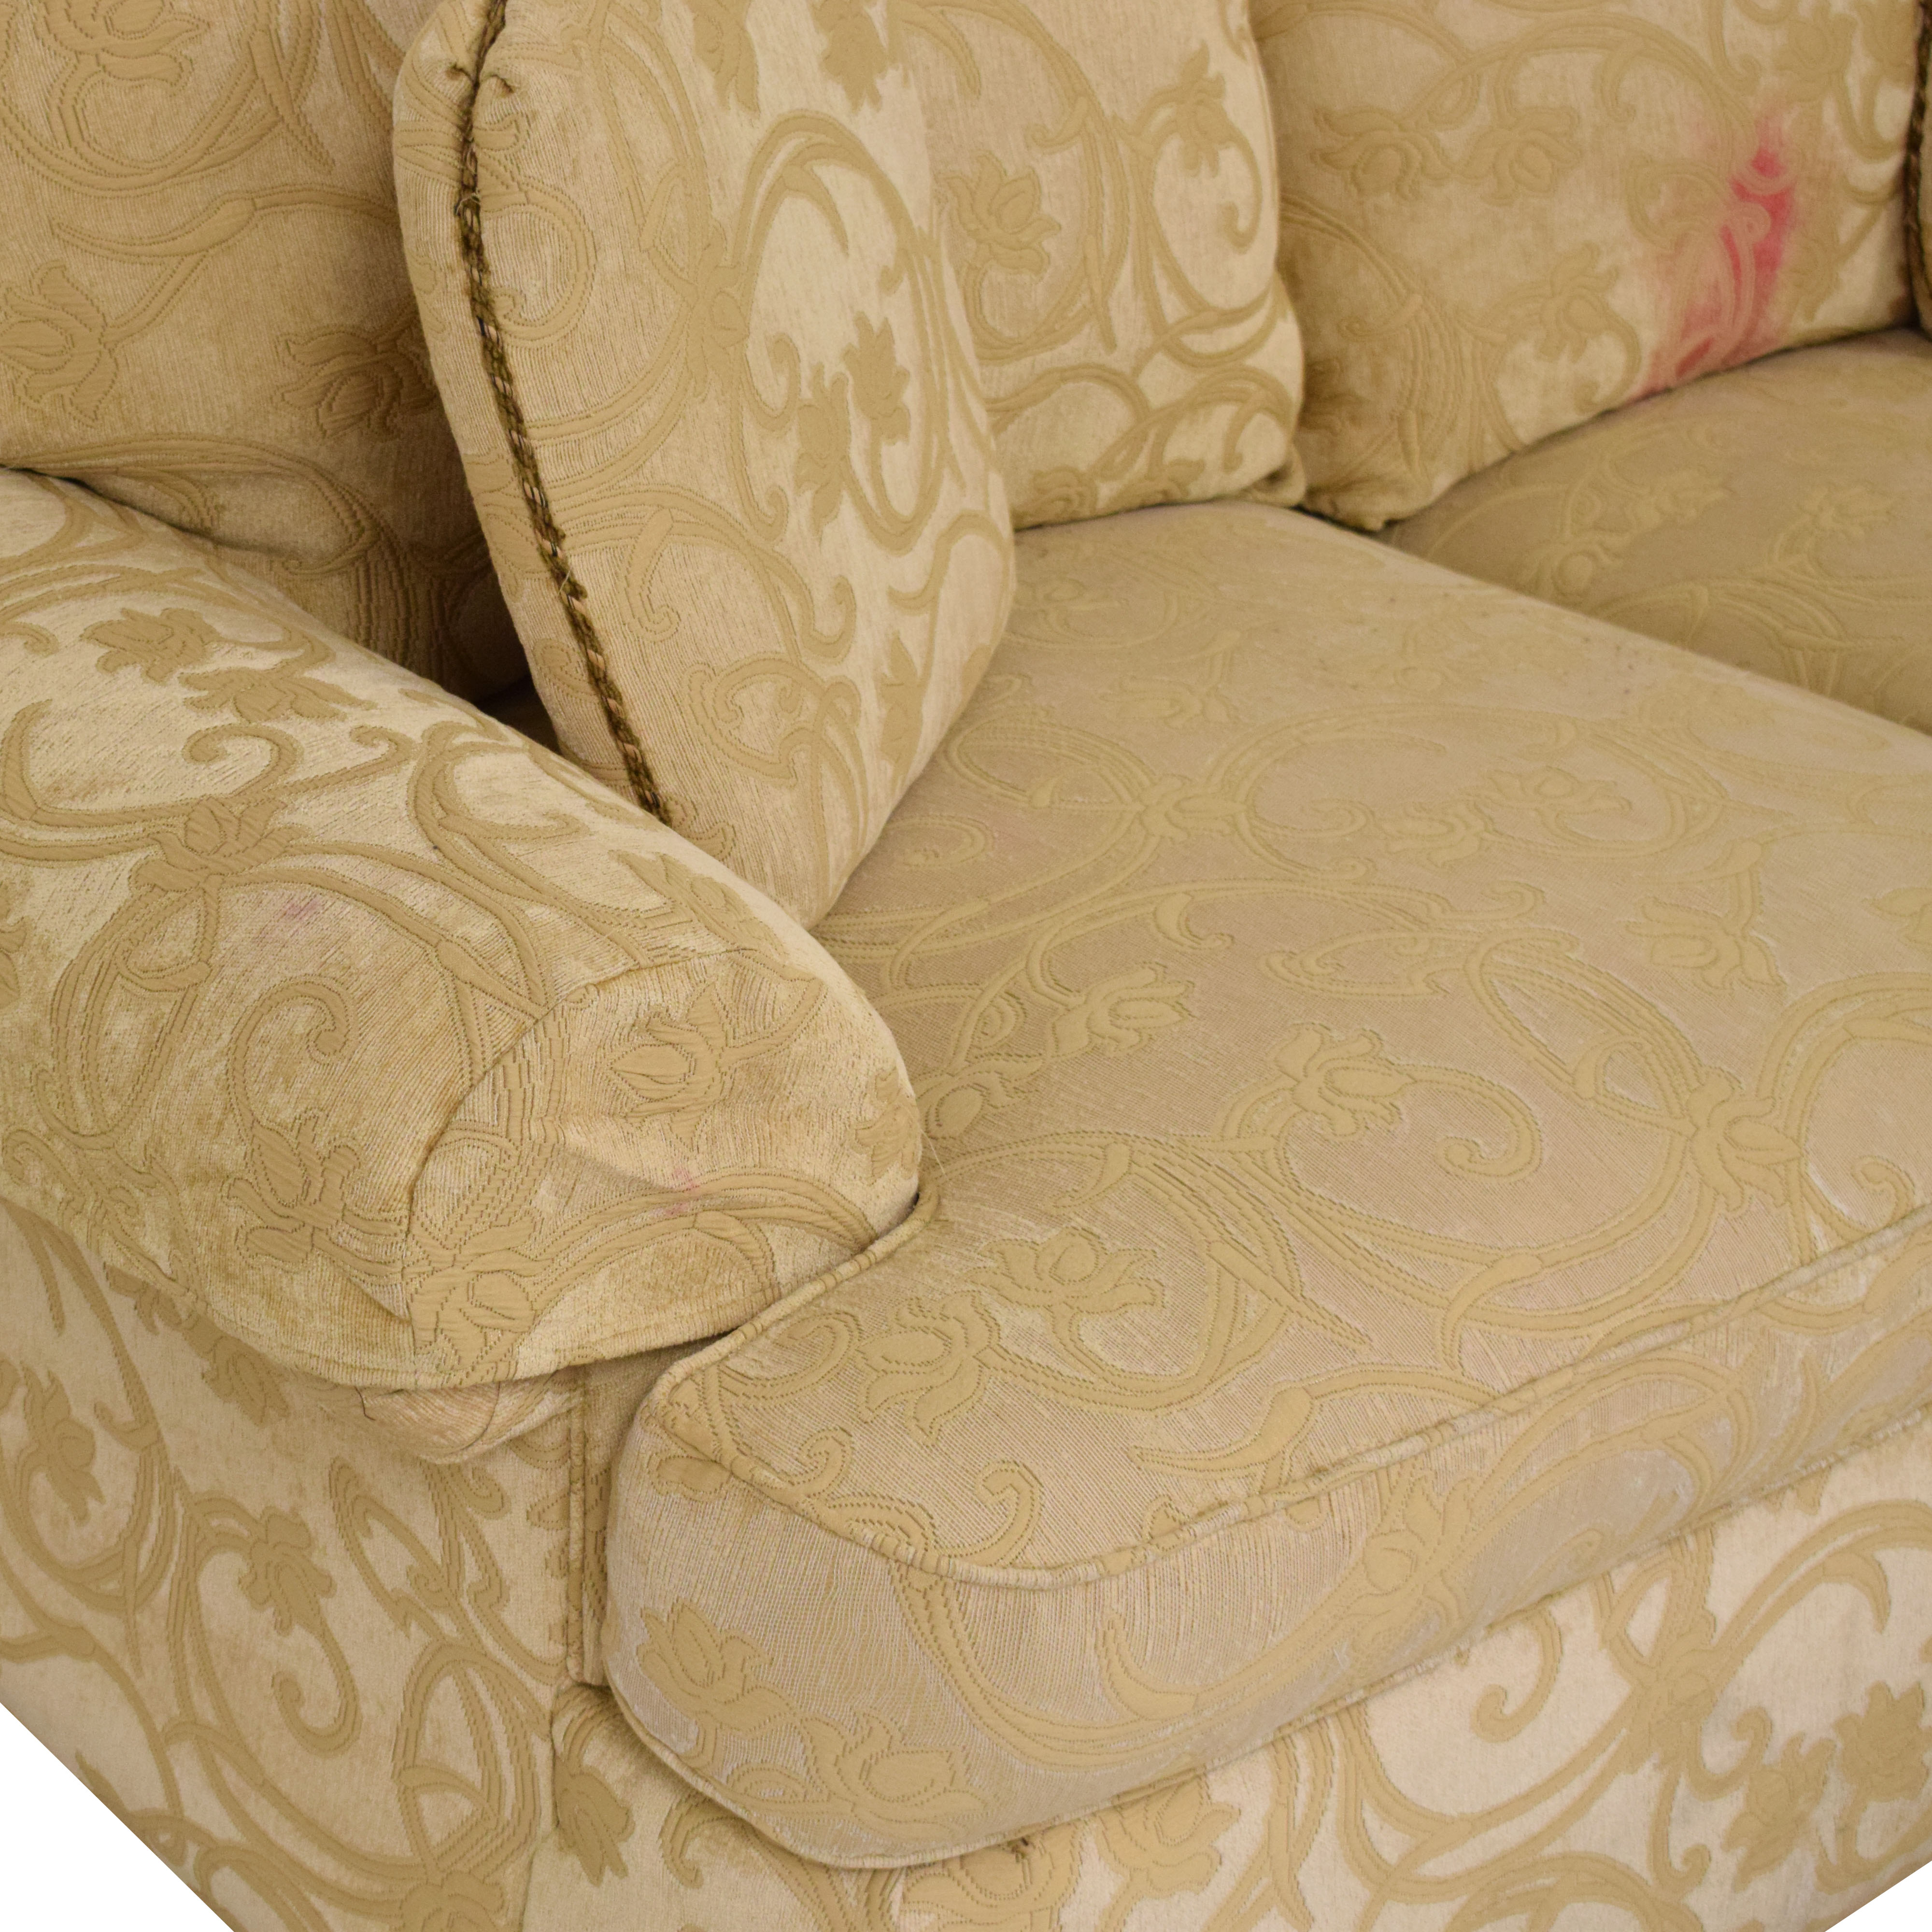 Thomasville Thomasville Slipcovered Sofa second hand